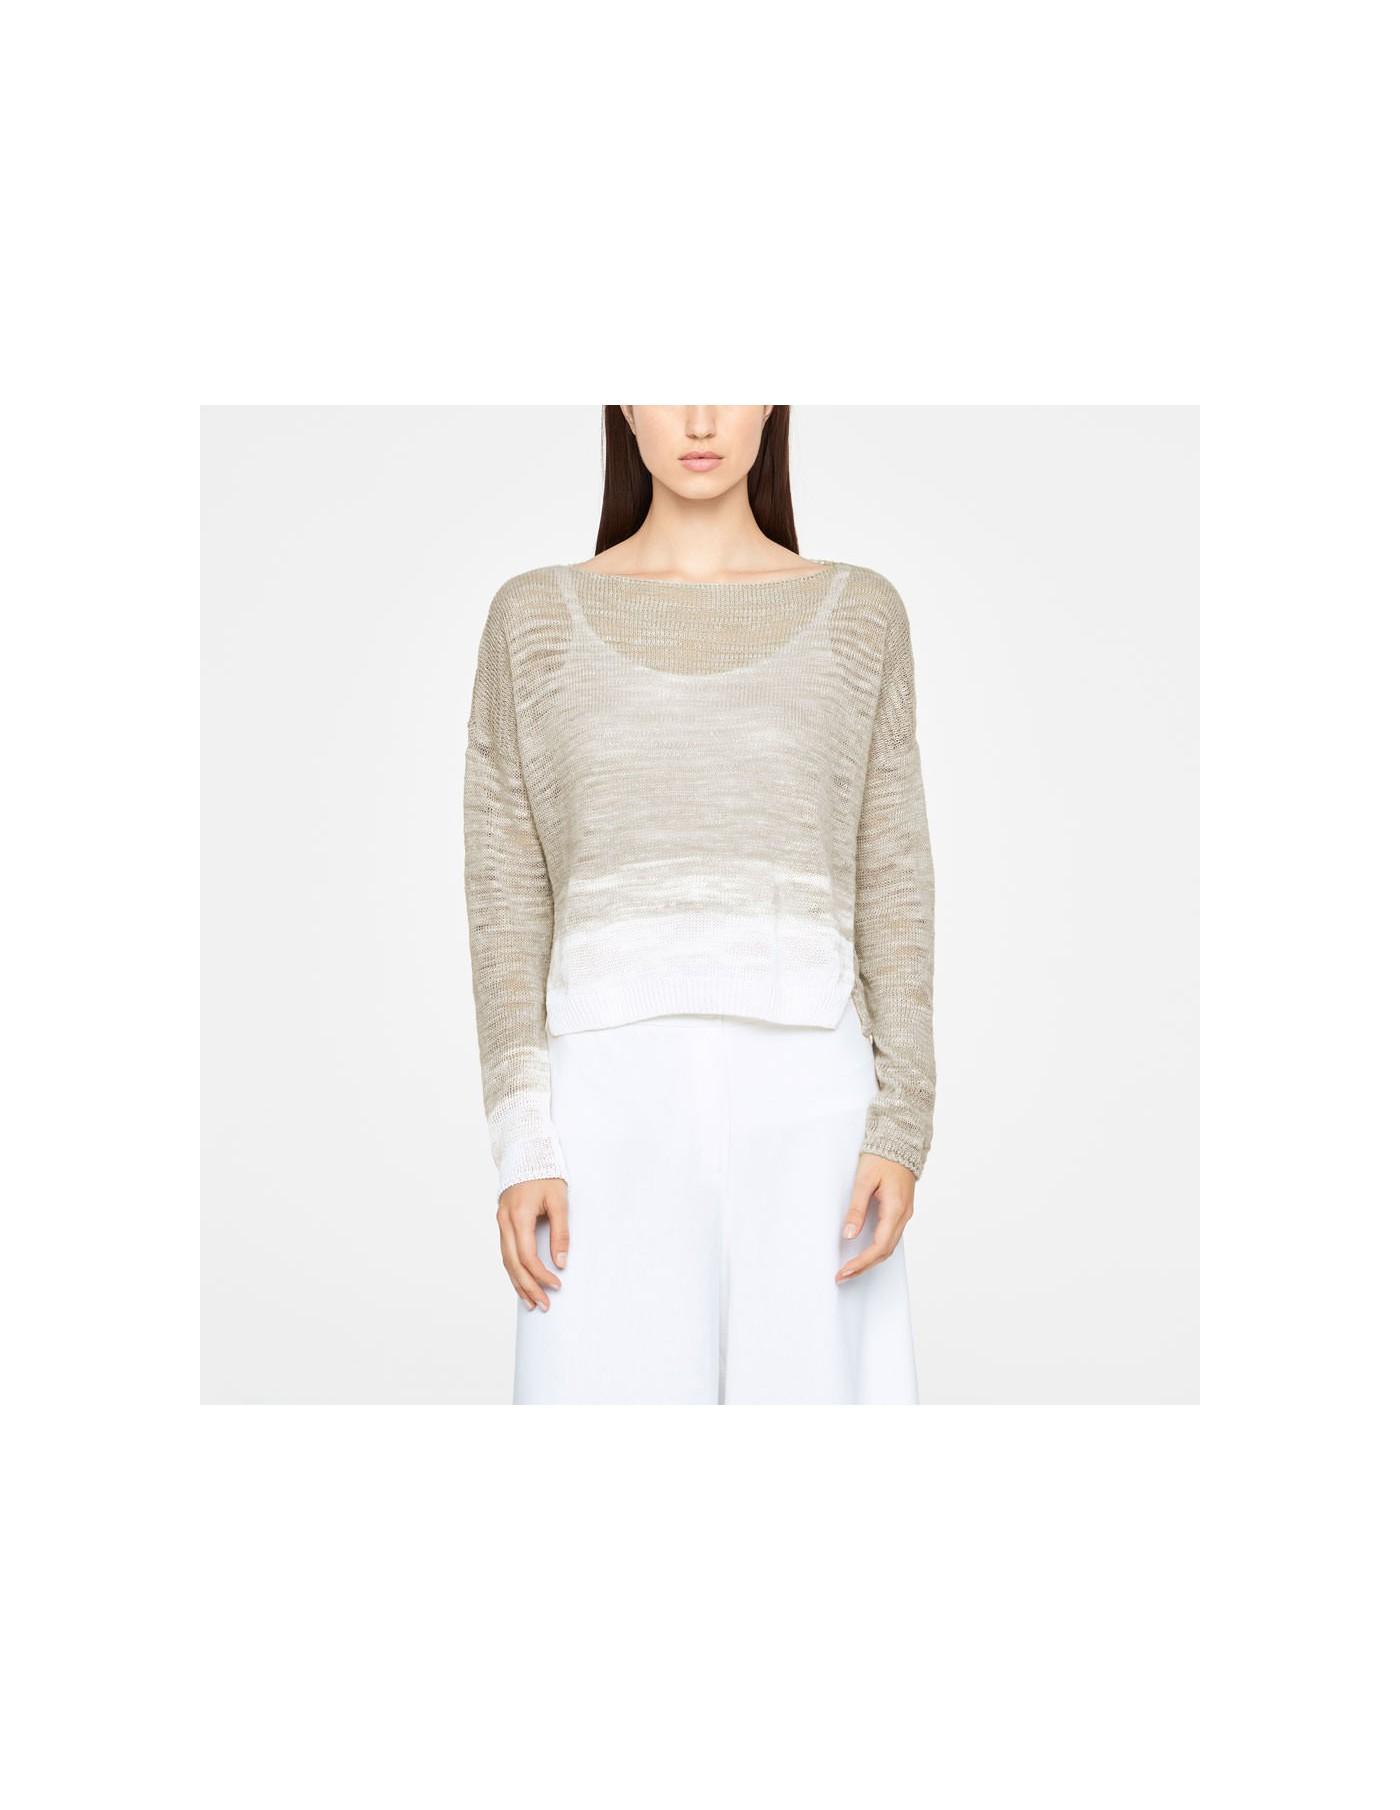 SARAHPACINI Sweater